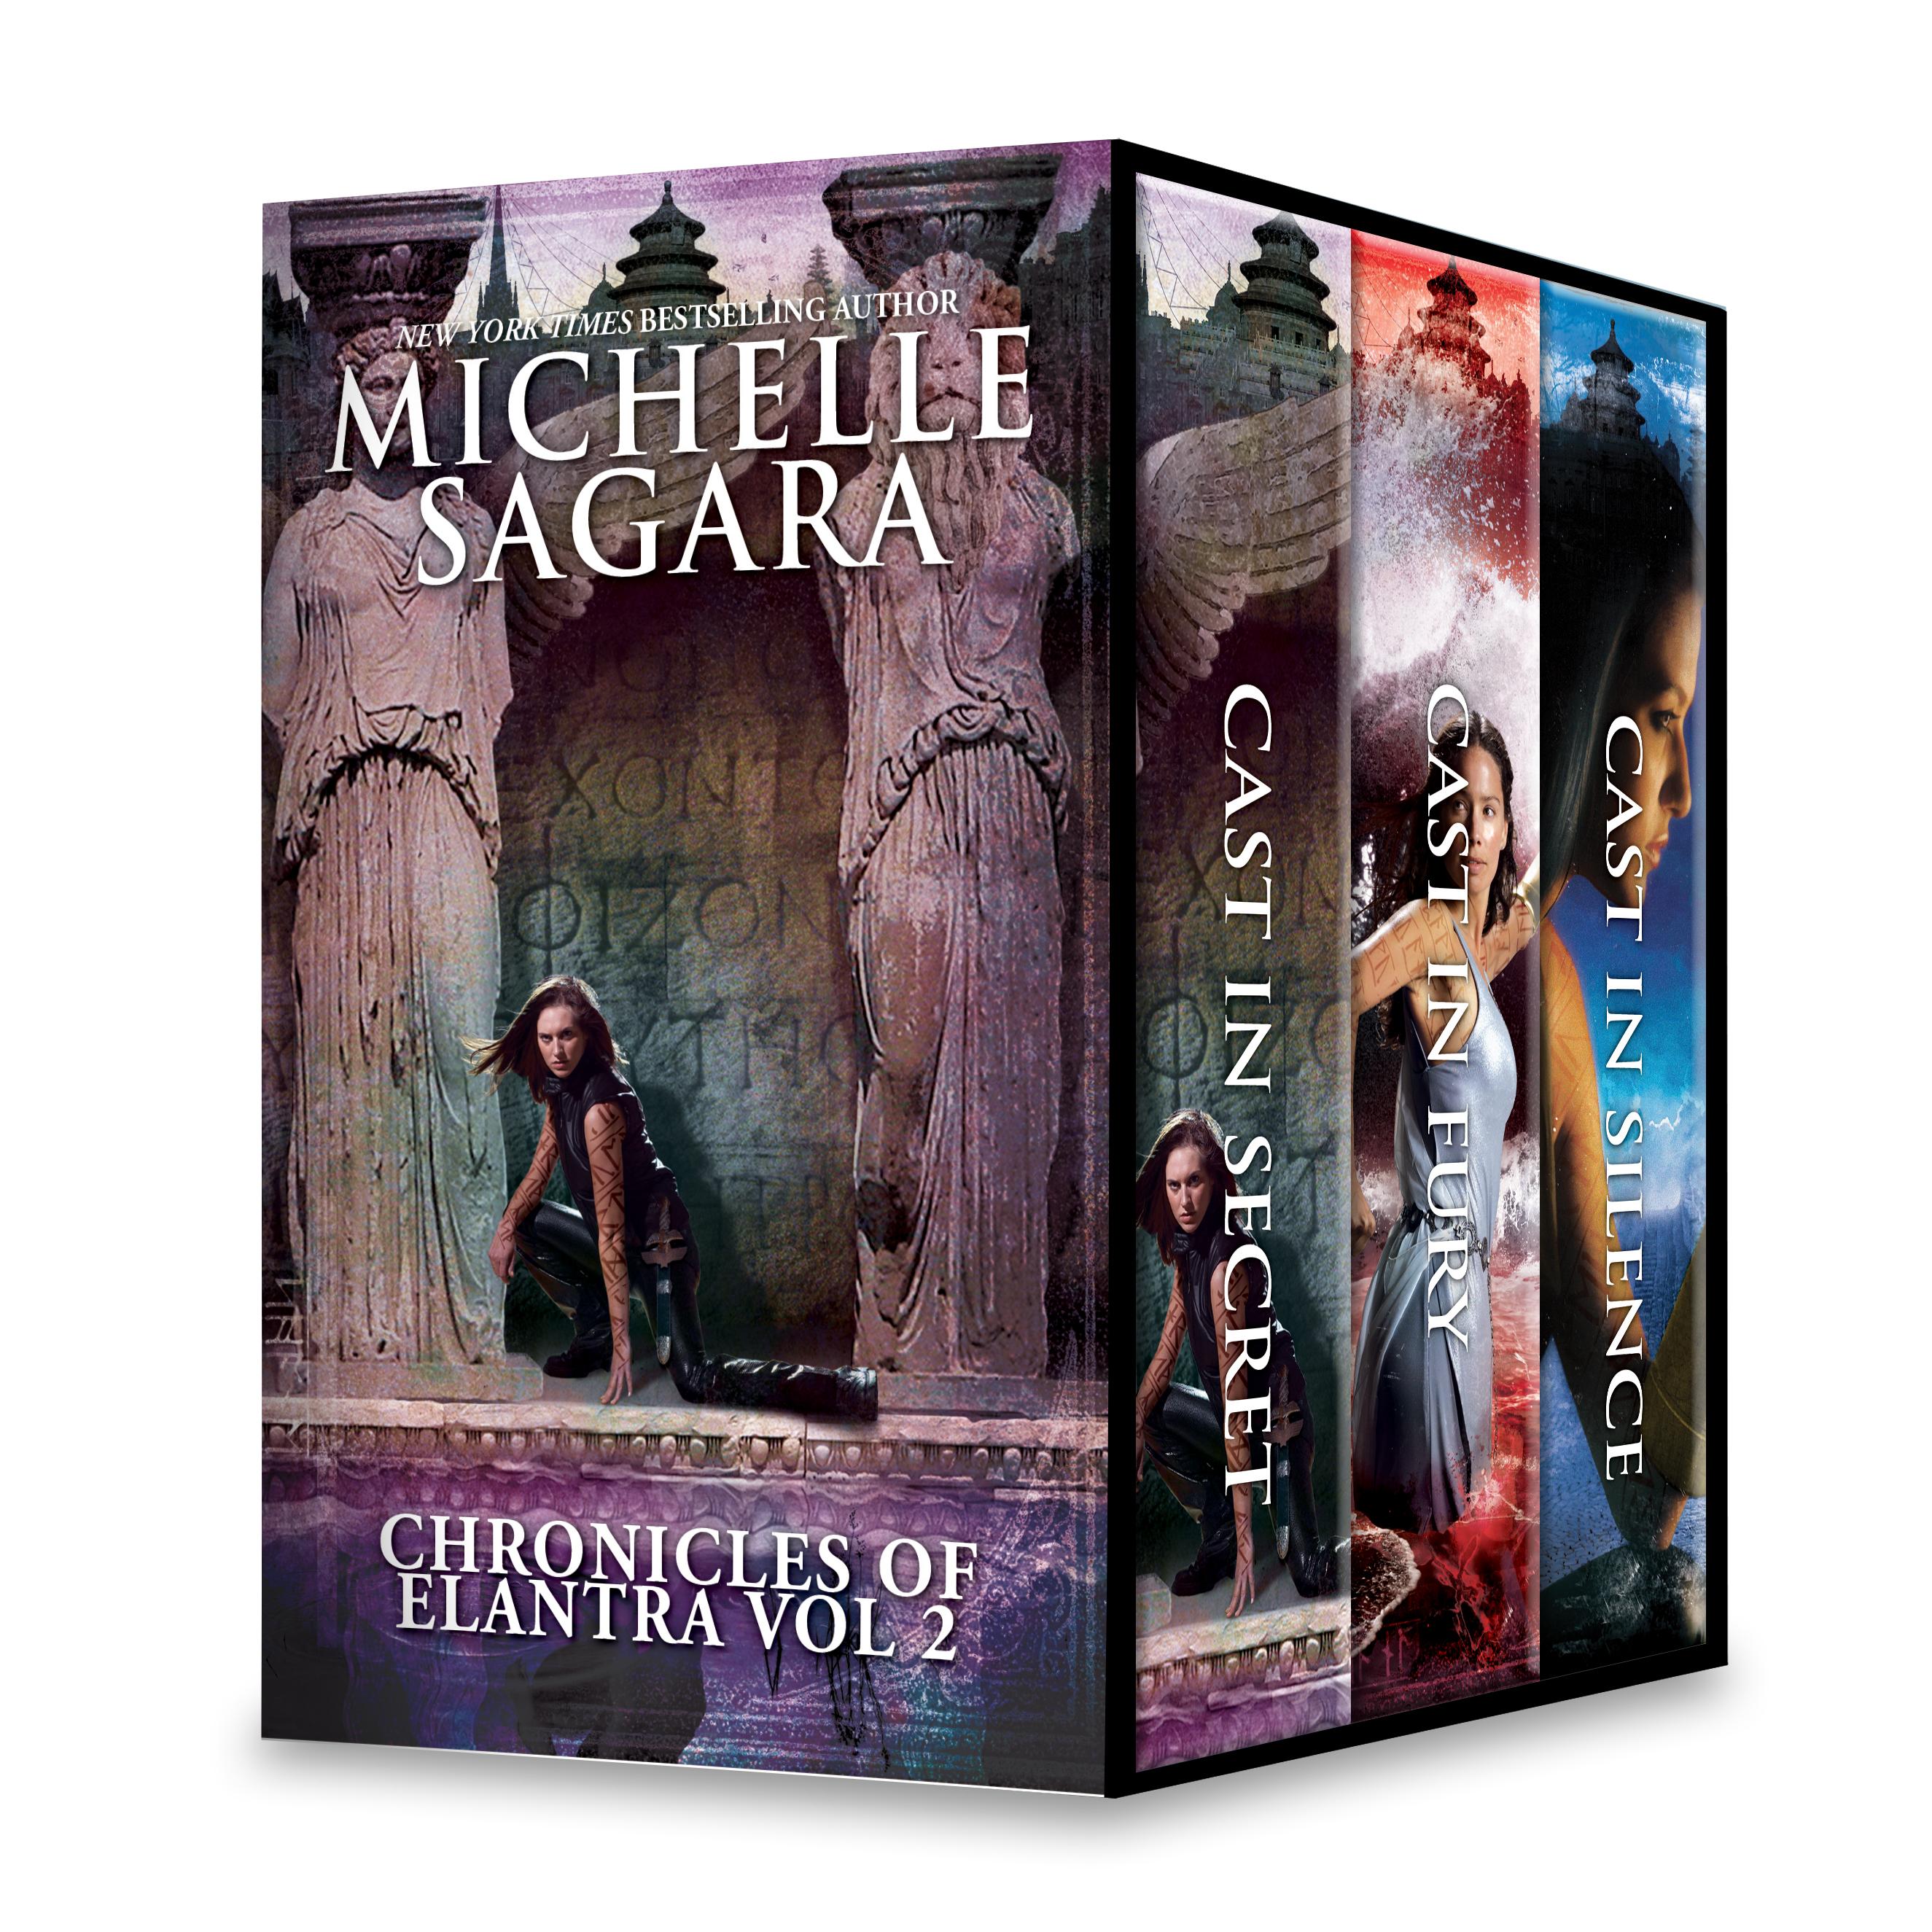 Michelle Sagara Chronicles of Elantra Vol 2 An Anthology